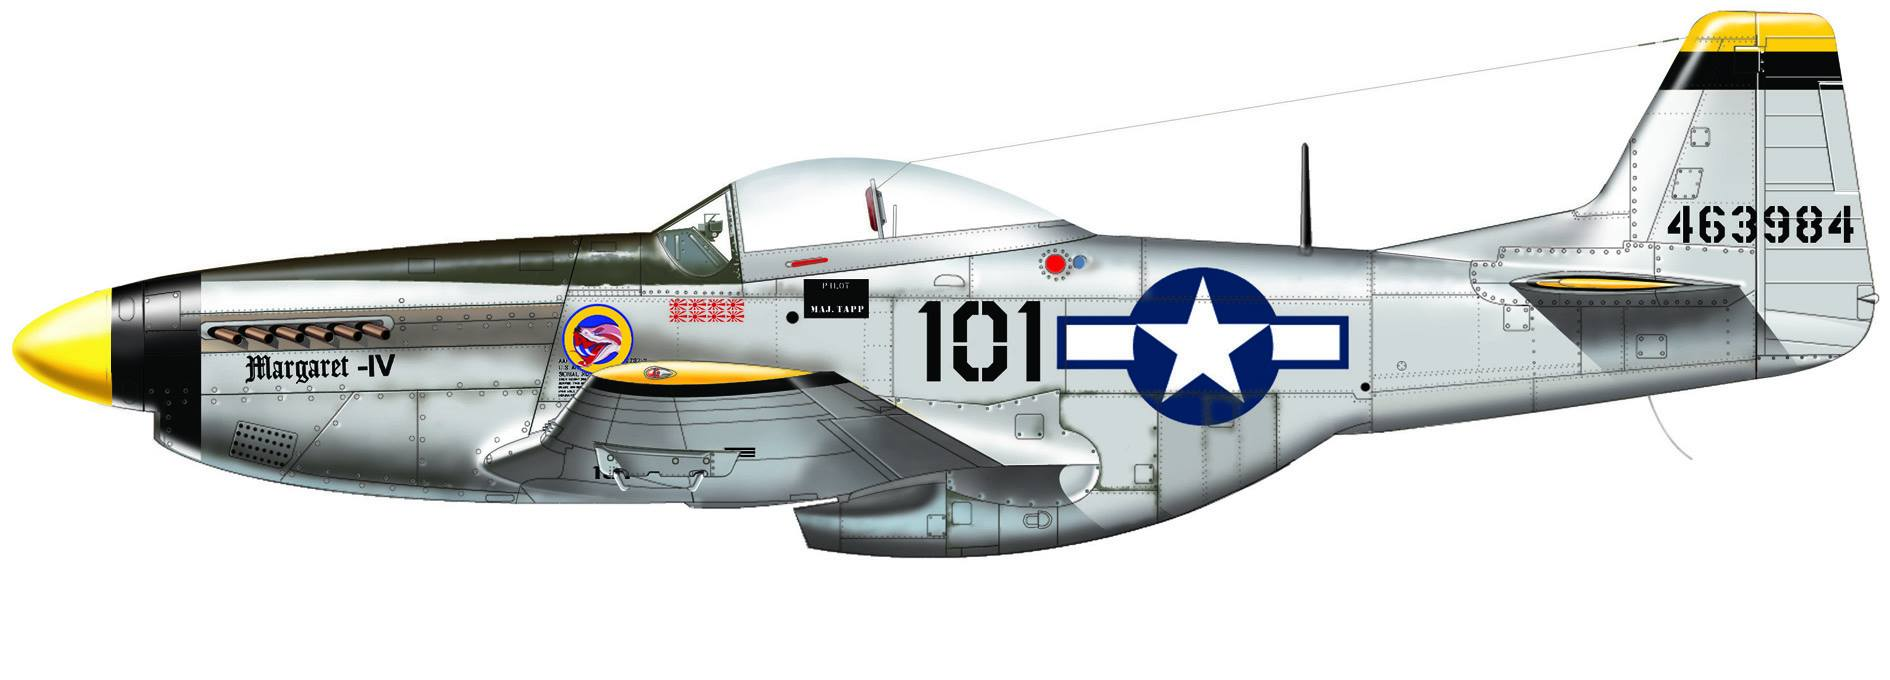 Maqueta P-51 de Italeri Pacific Aces 05